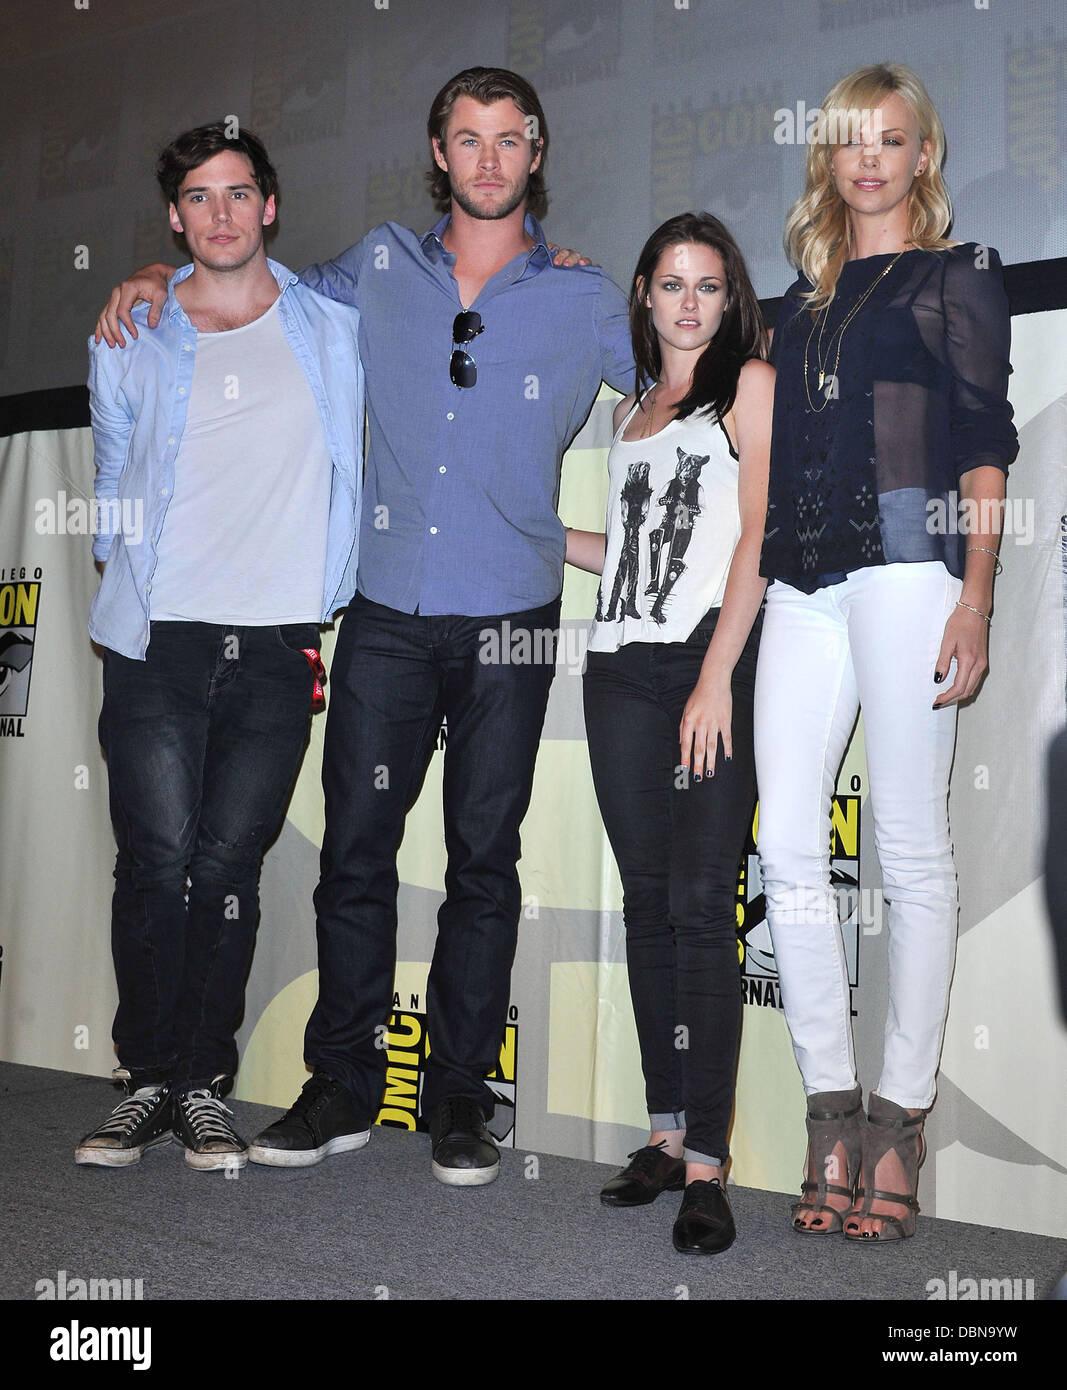 ¿Cuánto mide Nicole Kidman? - Altura - Real height Chris-hemsworth-charlize-theron-kirsten-stewart-sam-claflin-comic-DBN9YW